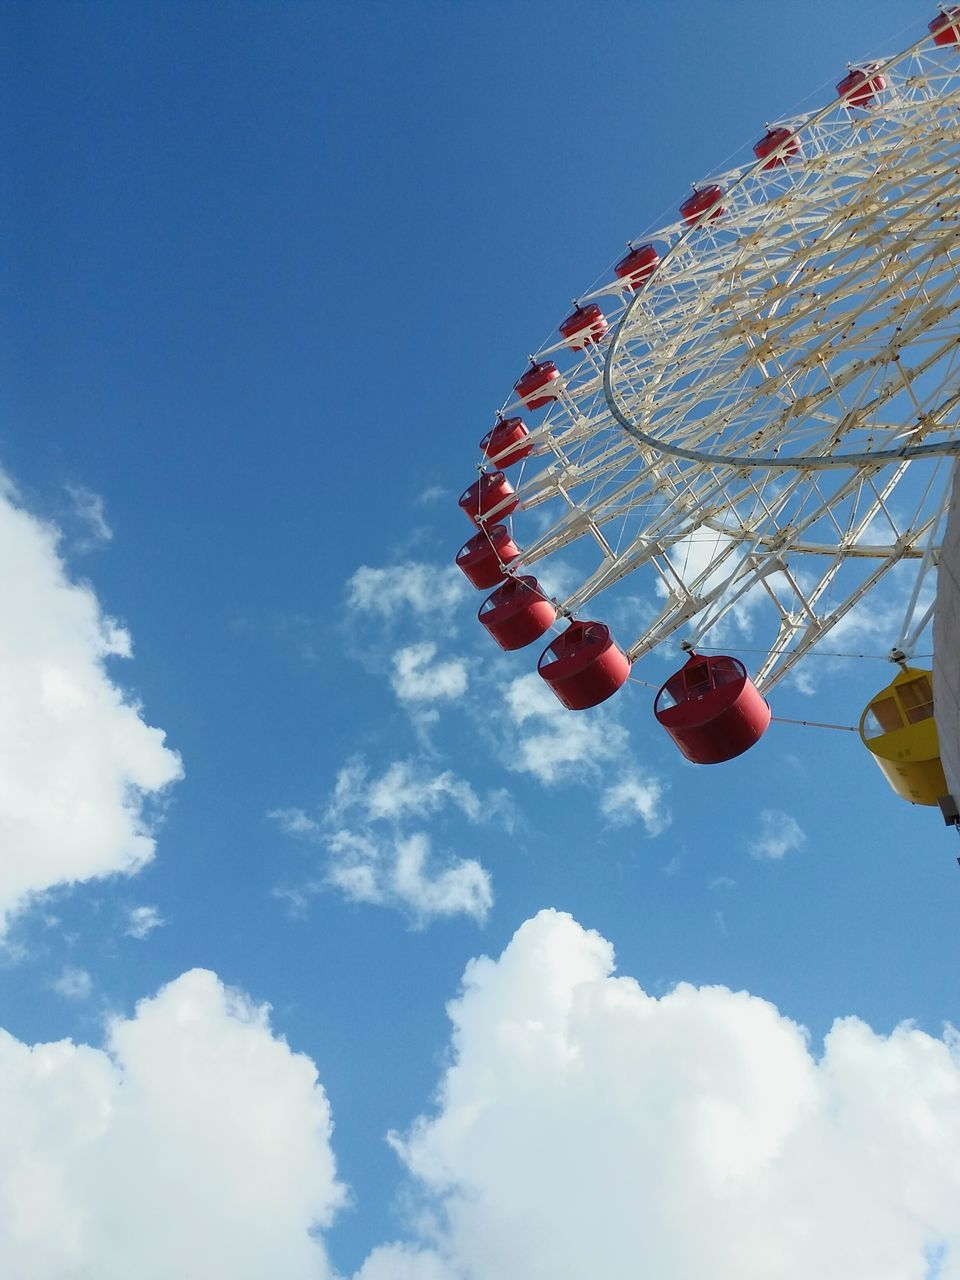 amusement park, low angle view, arts culture and entertainment, sky, cloud - sky, amusement park ride, red, blue, day, no people, outdoors, leisure activity, ferris wheel